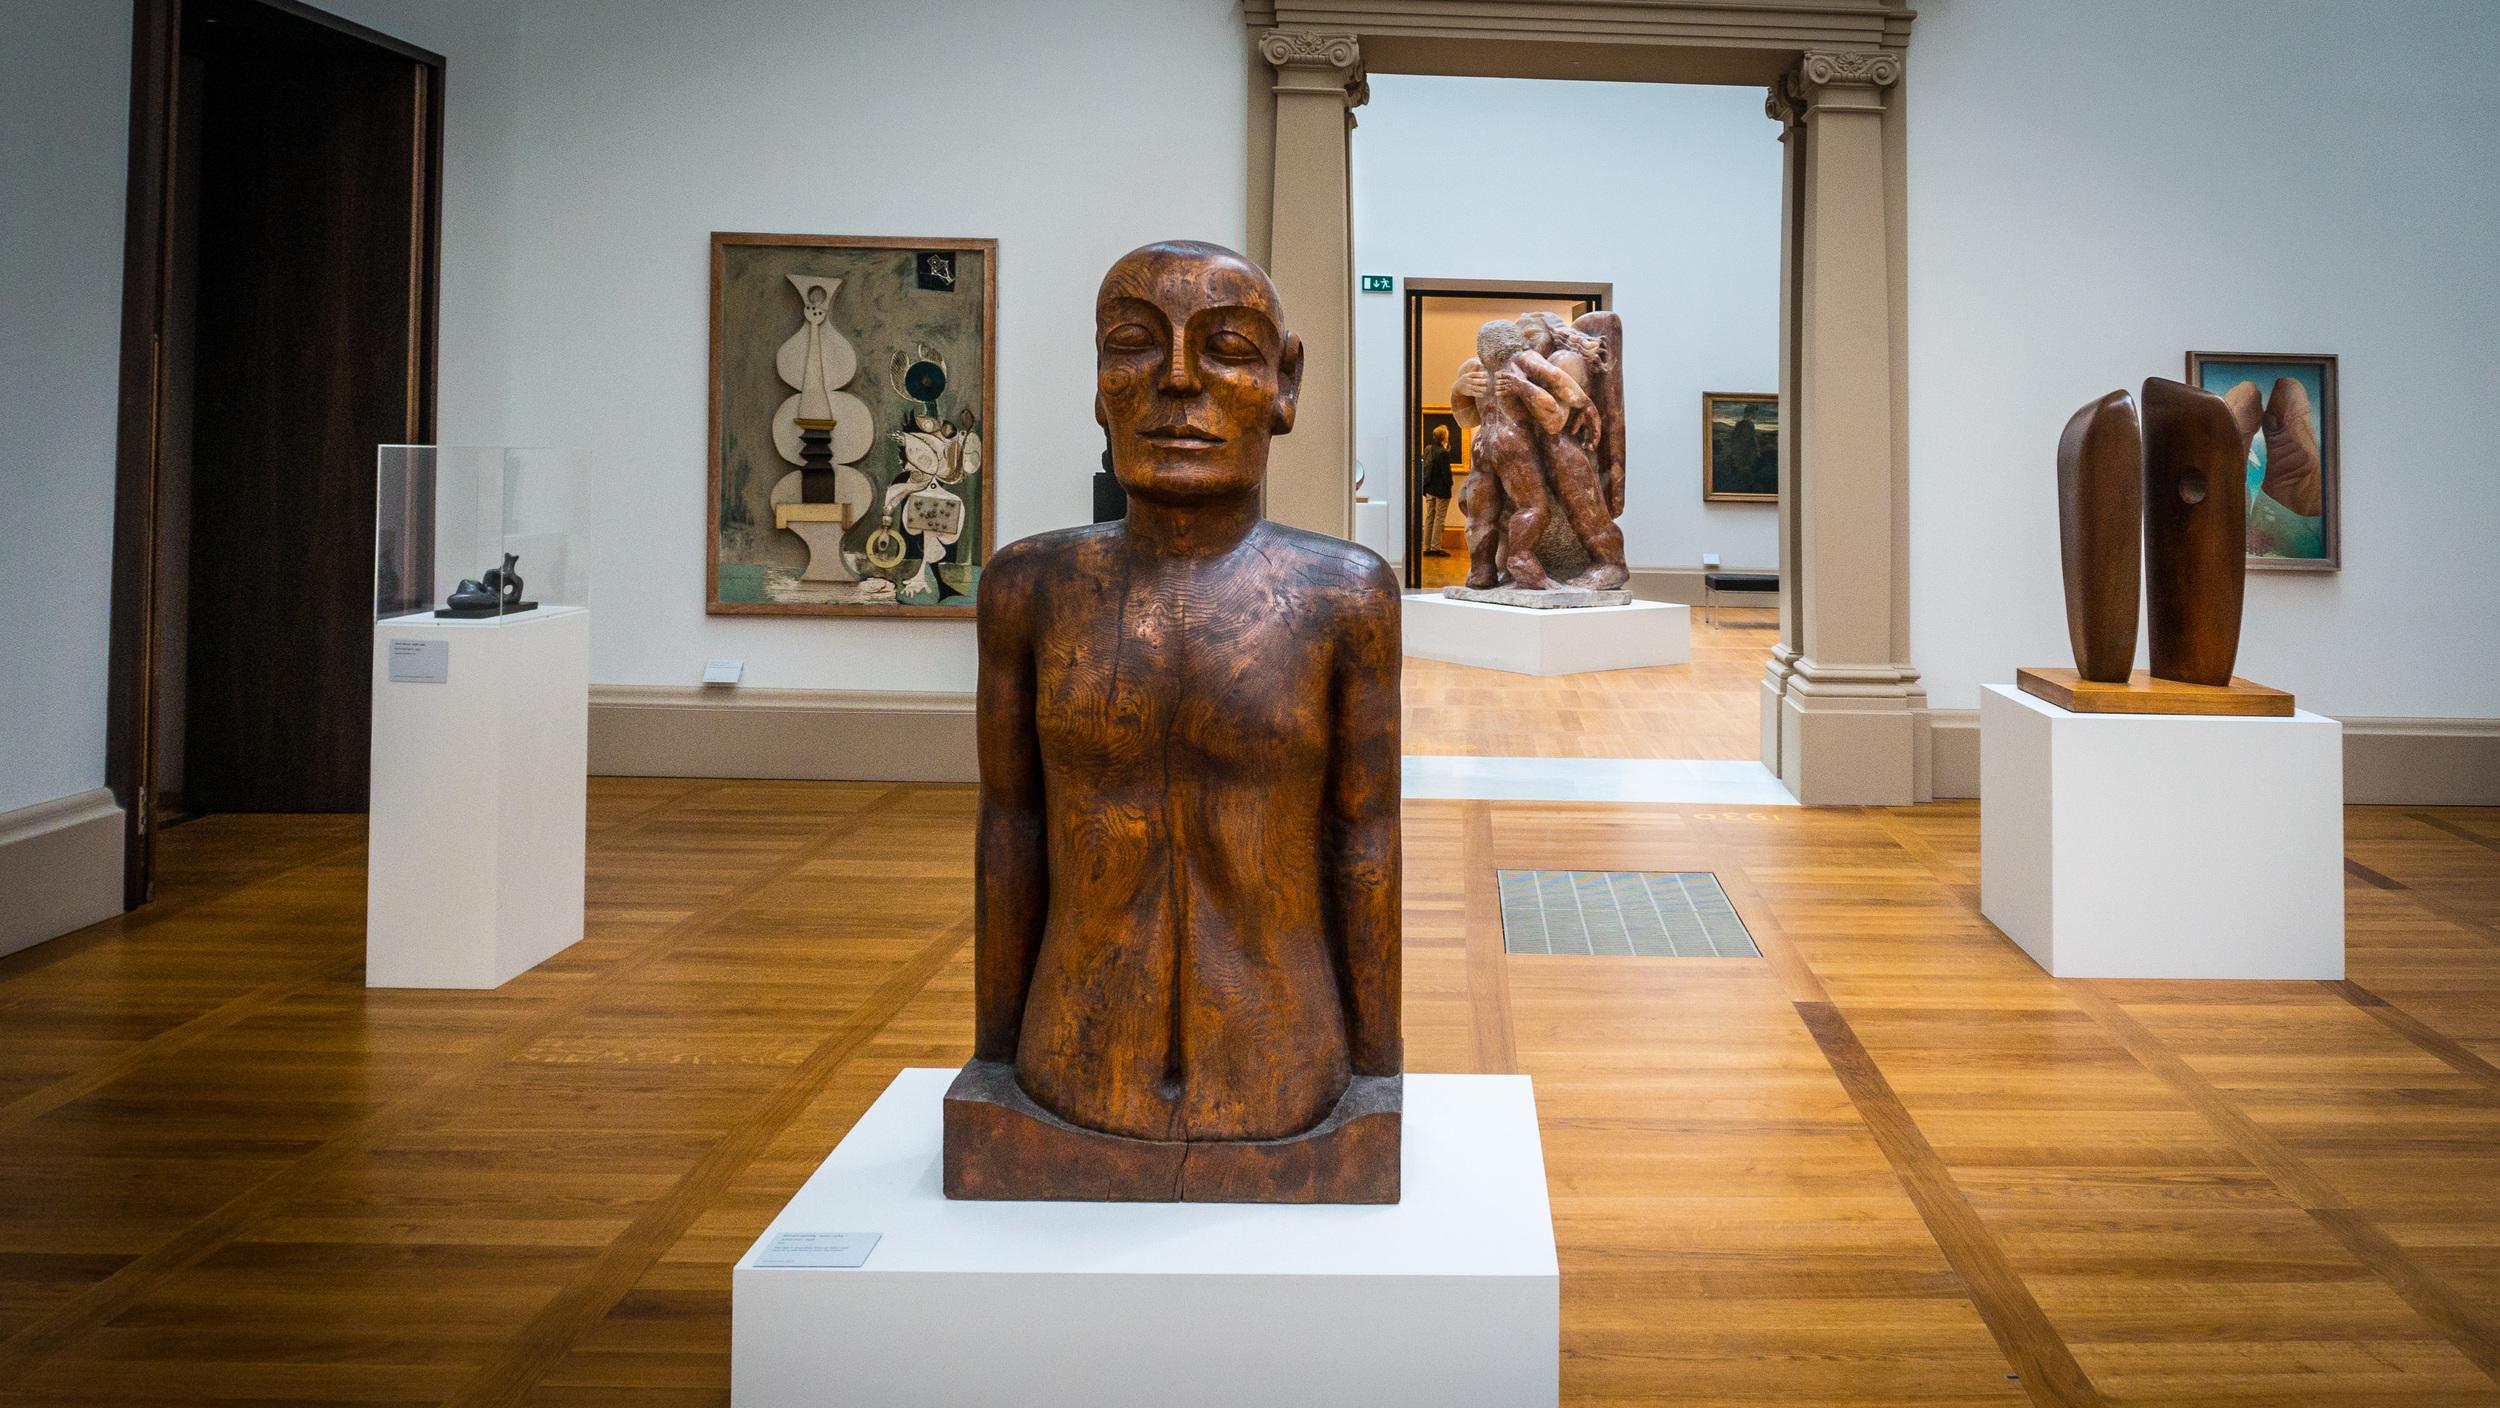 Sculpture at Tate Britain